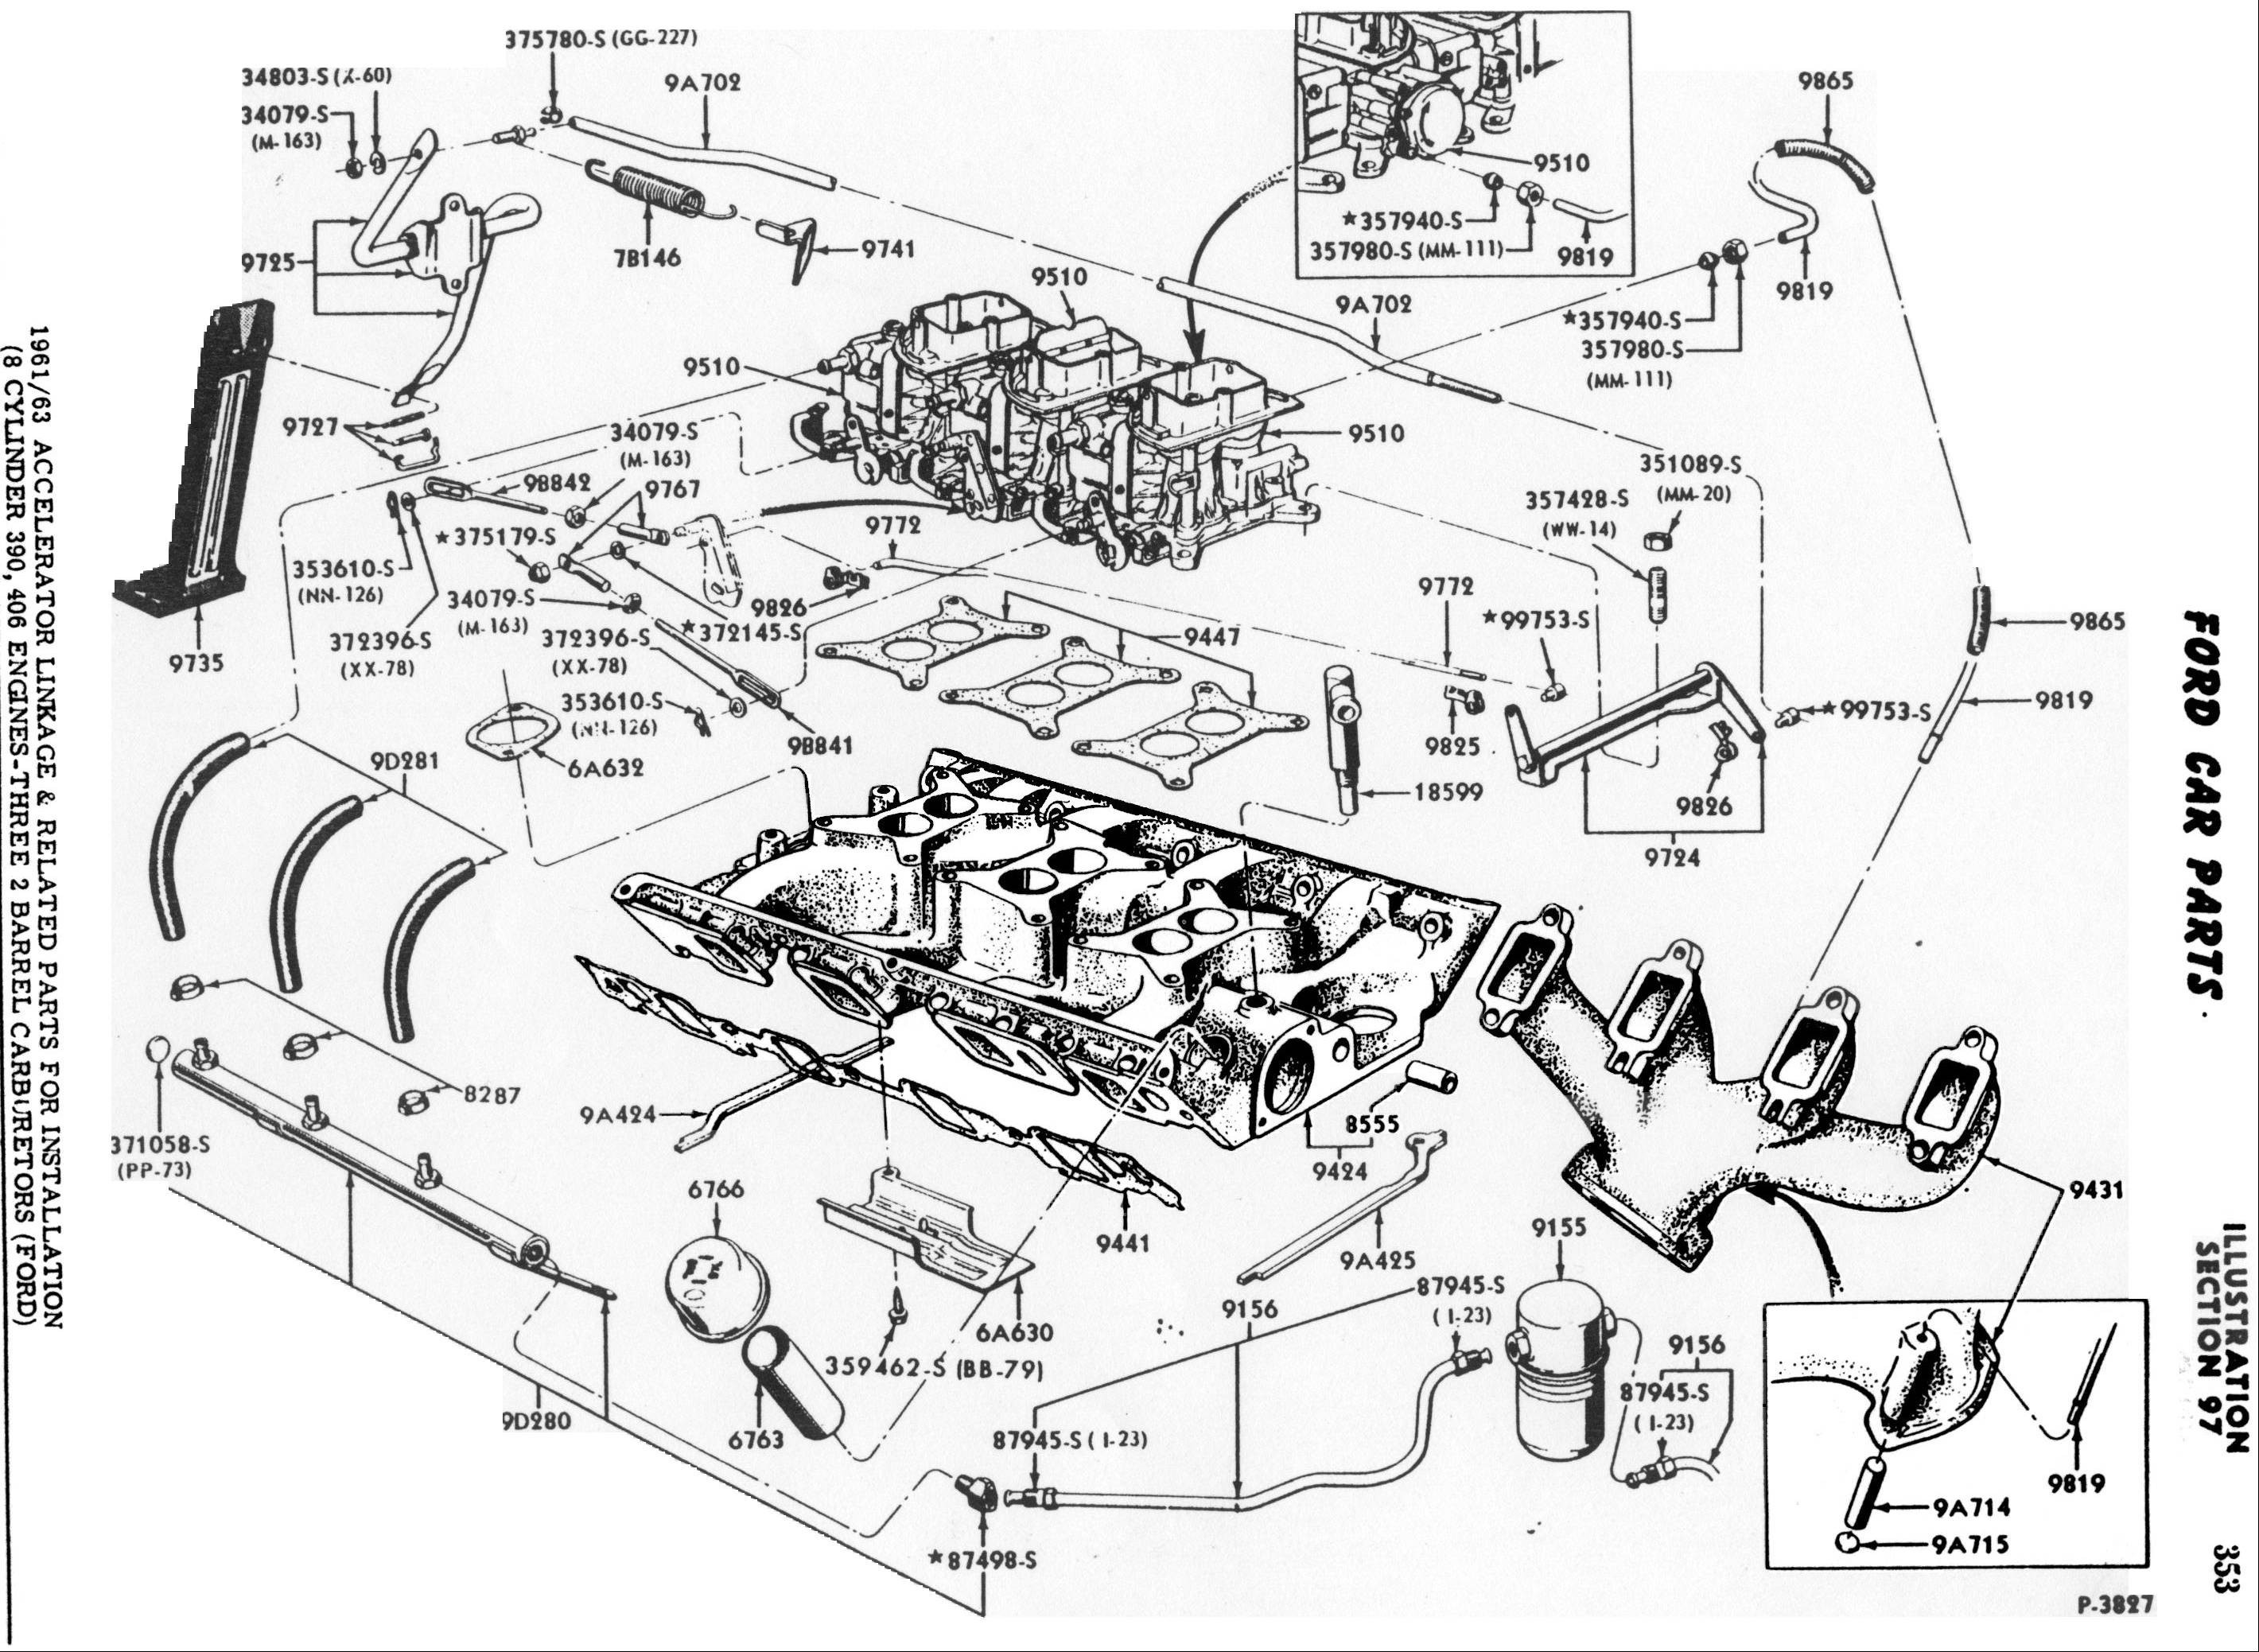 Ford 460 Engine Wiring Diagram ford F 250 460 Engine Diagram Wiring Diagram Motor Motor